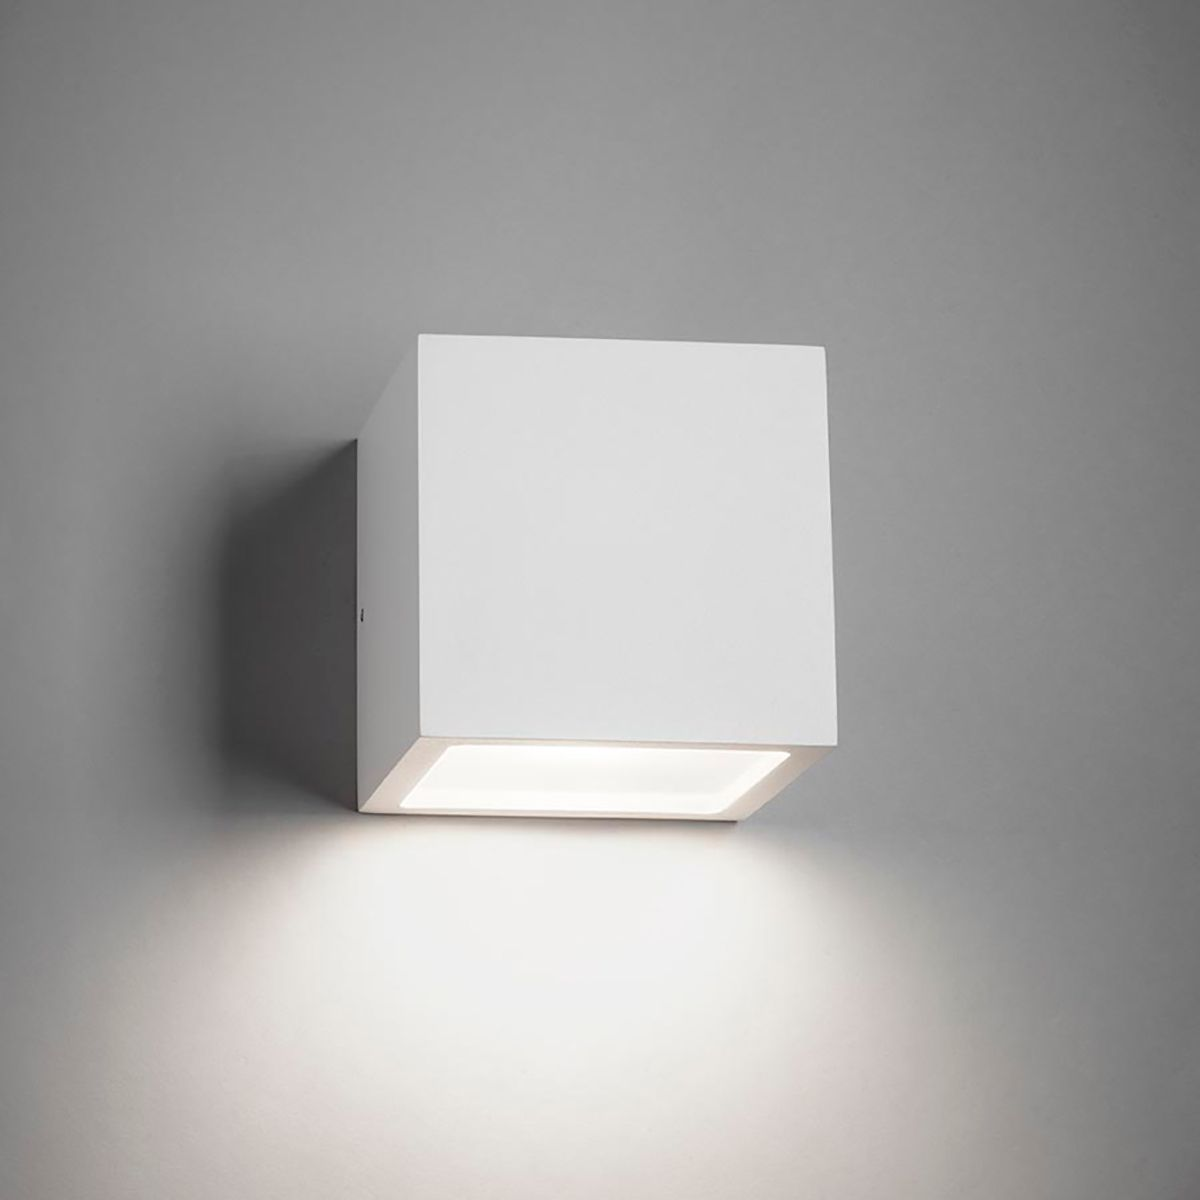 CUBE DOWN LED